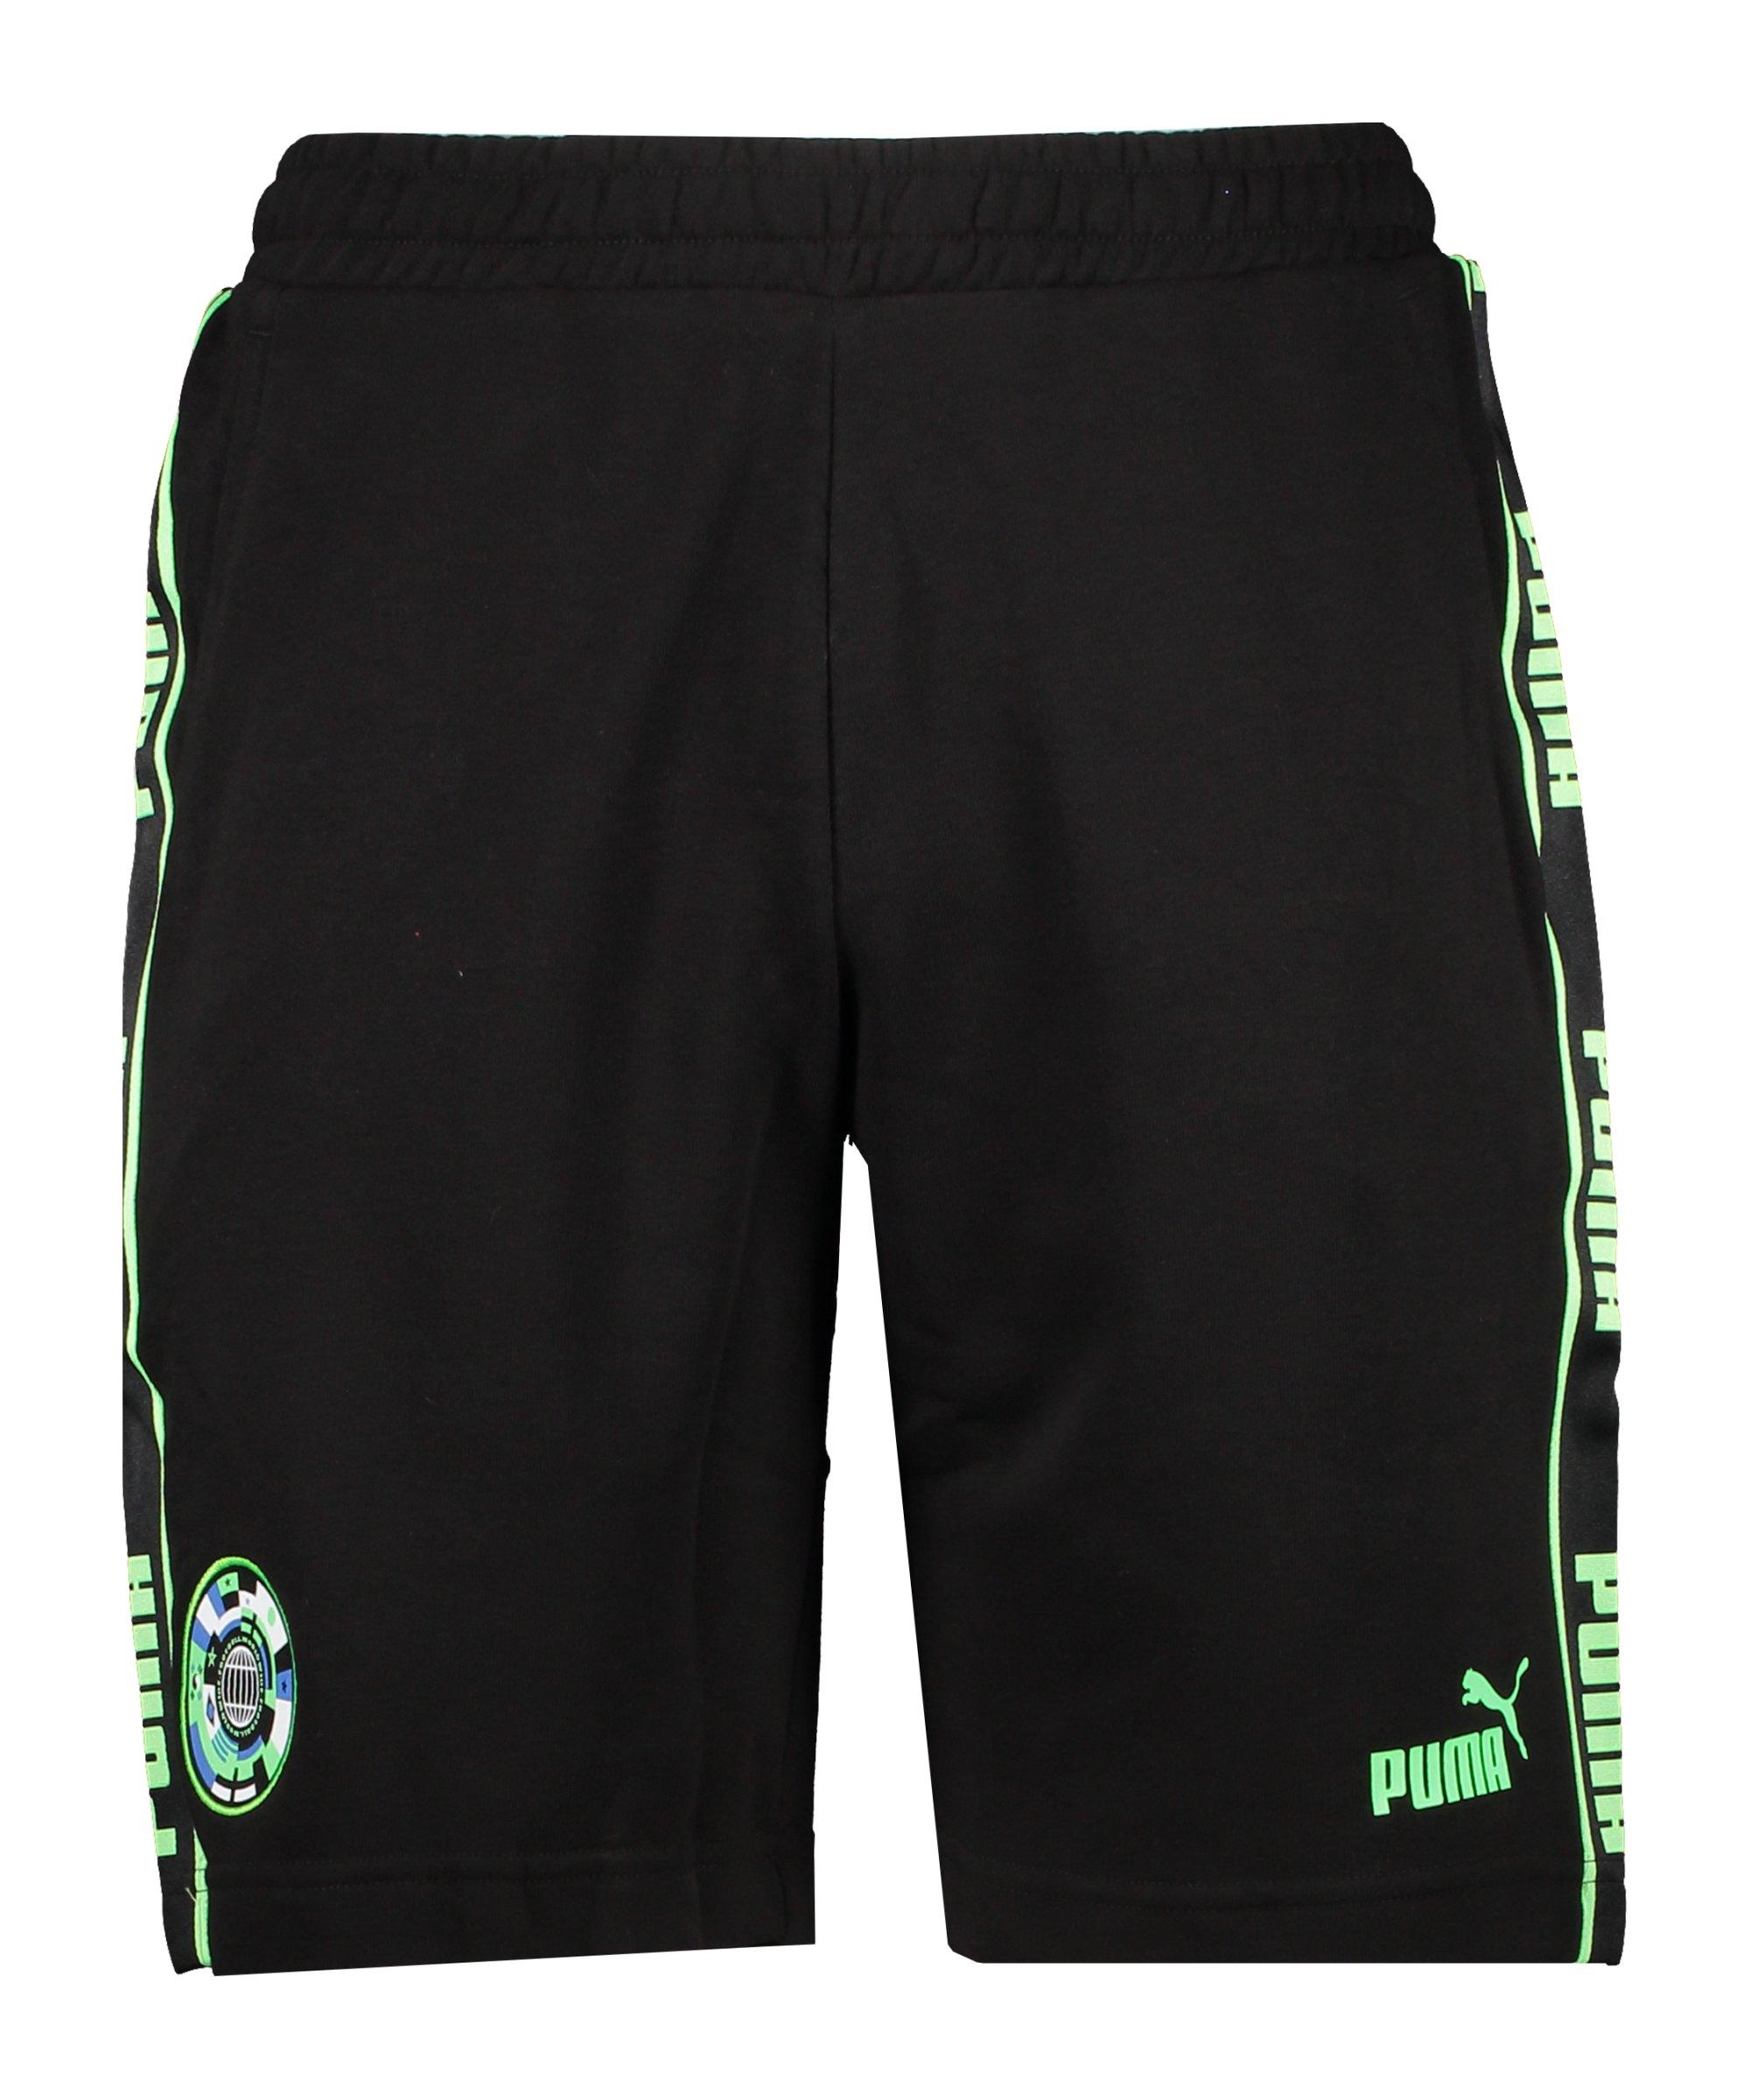 PUMA 365 Football Short Schwarz F01 - schwarz